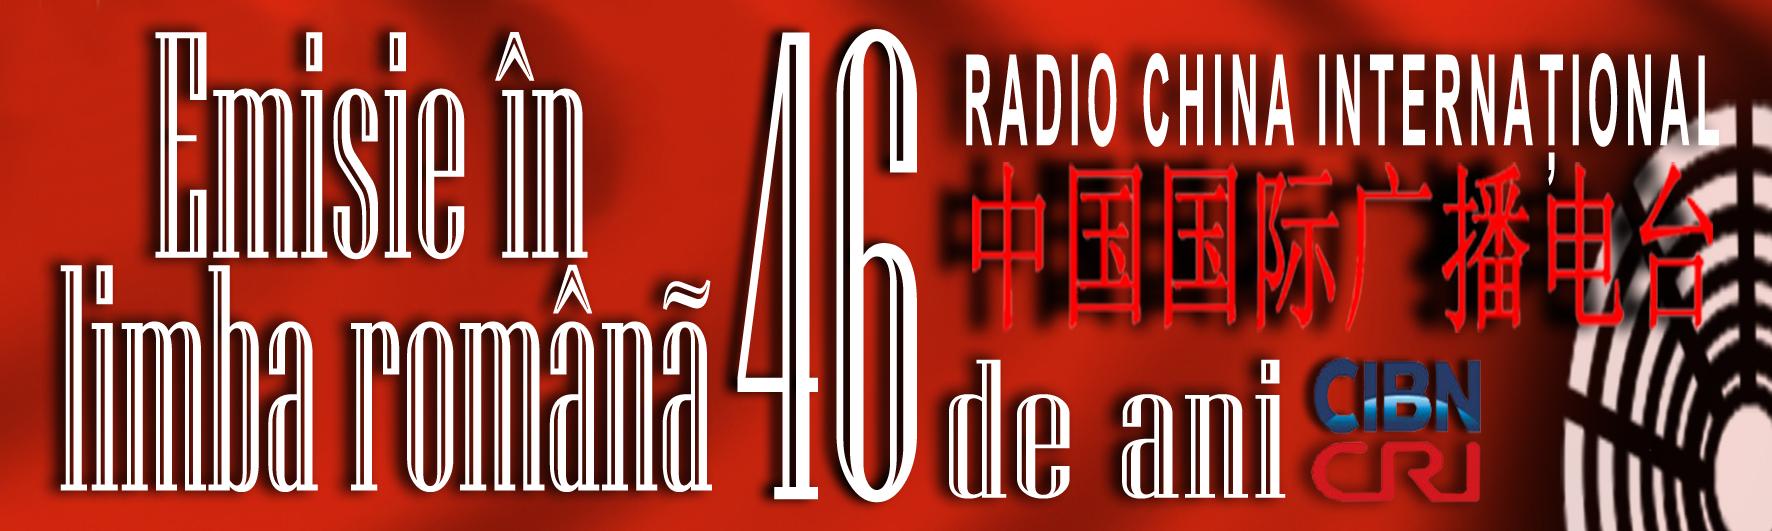 Limba ROMANA - 46 de ani la Radio China International, 29 august 2014